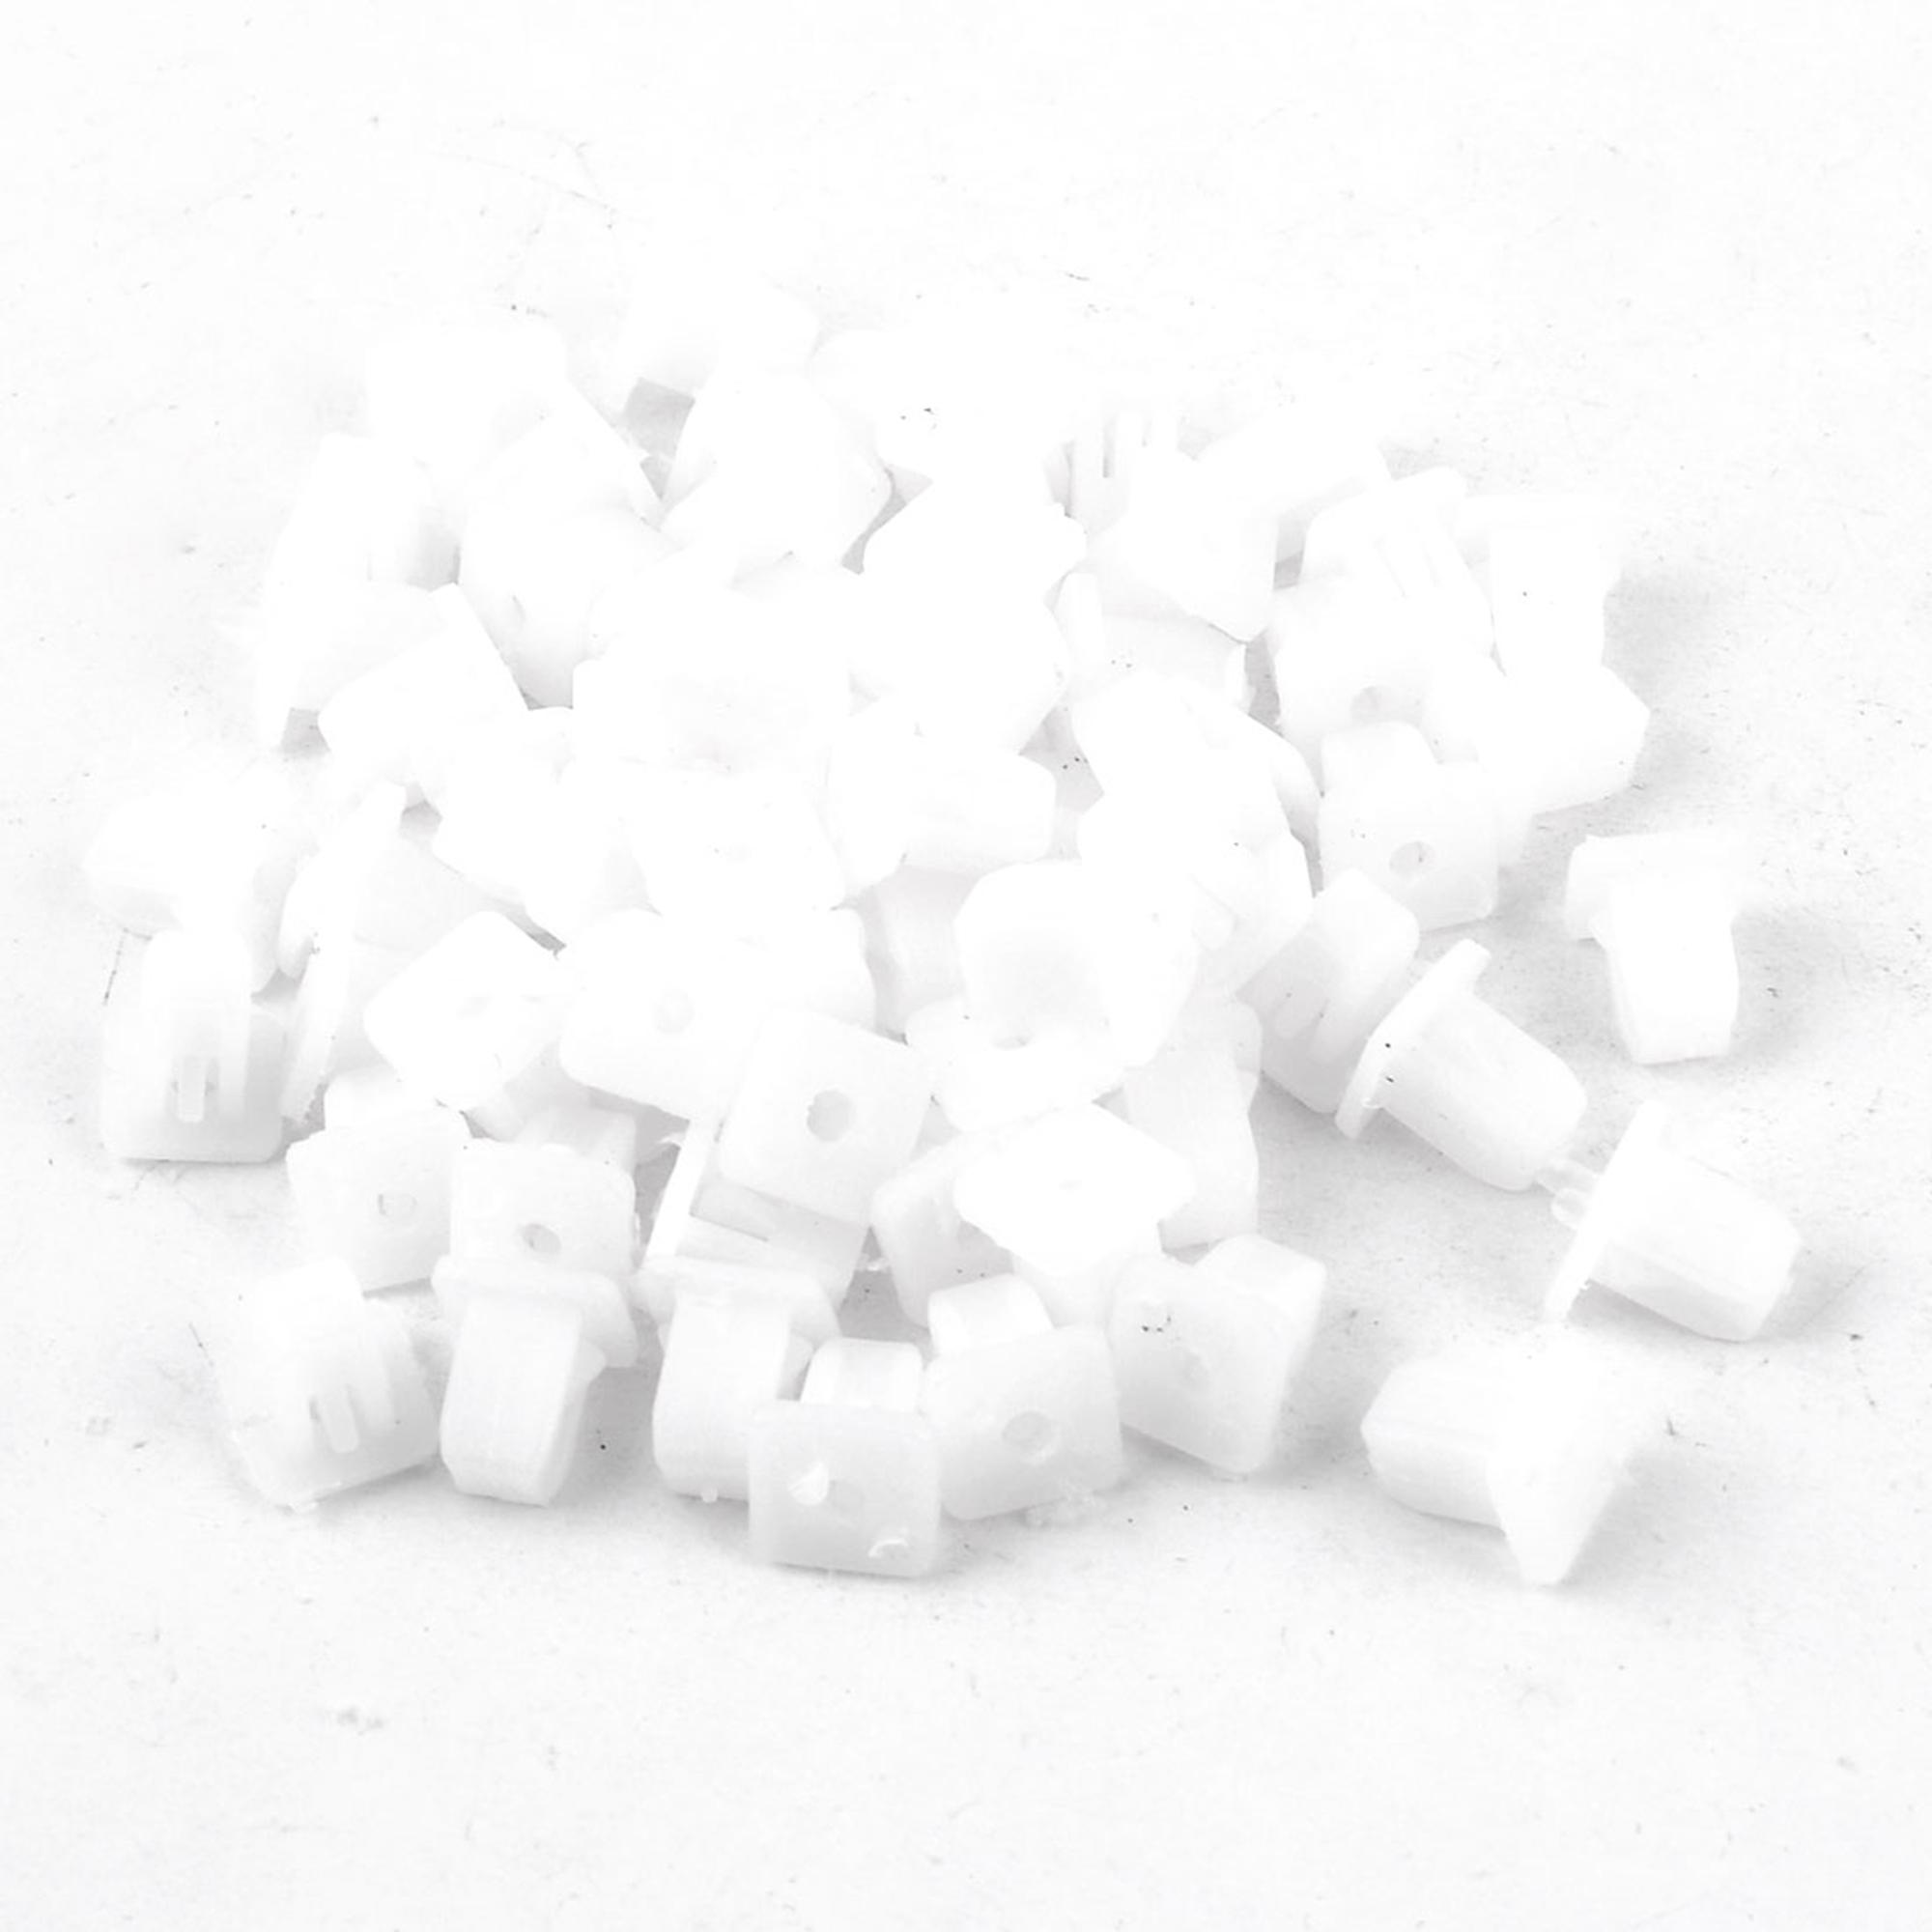 100pcs Car White 9mm Hole Square Plastic Rivets Fastener Fender Bumper Clips